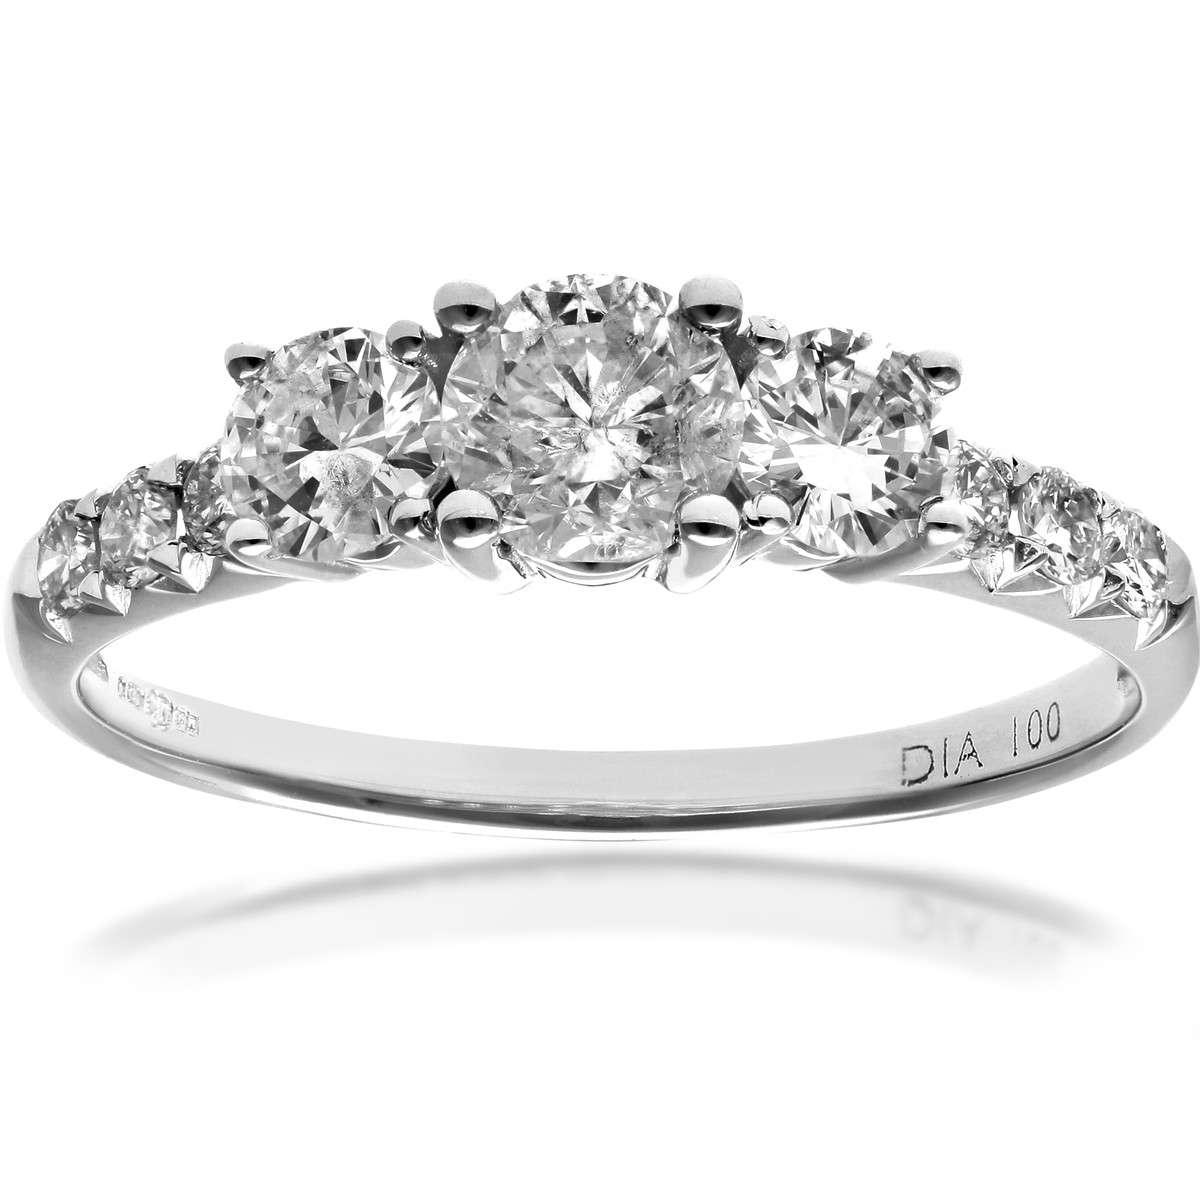 18CT WHITE GOLD 1.00CT DIAMOND ENGAGEMENT SHOULDER RING